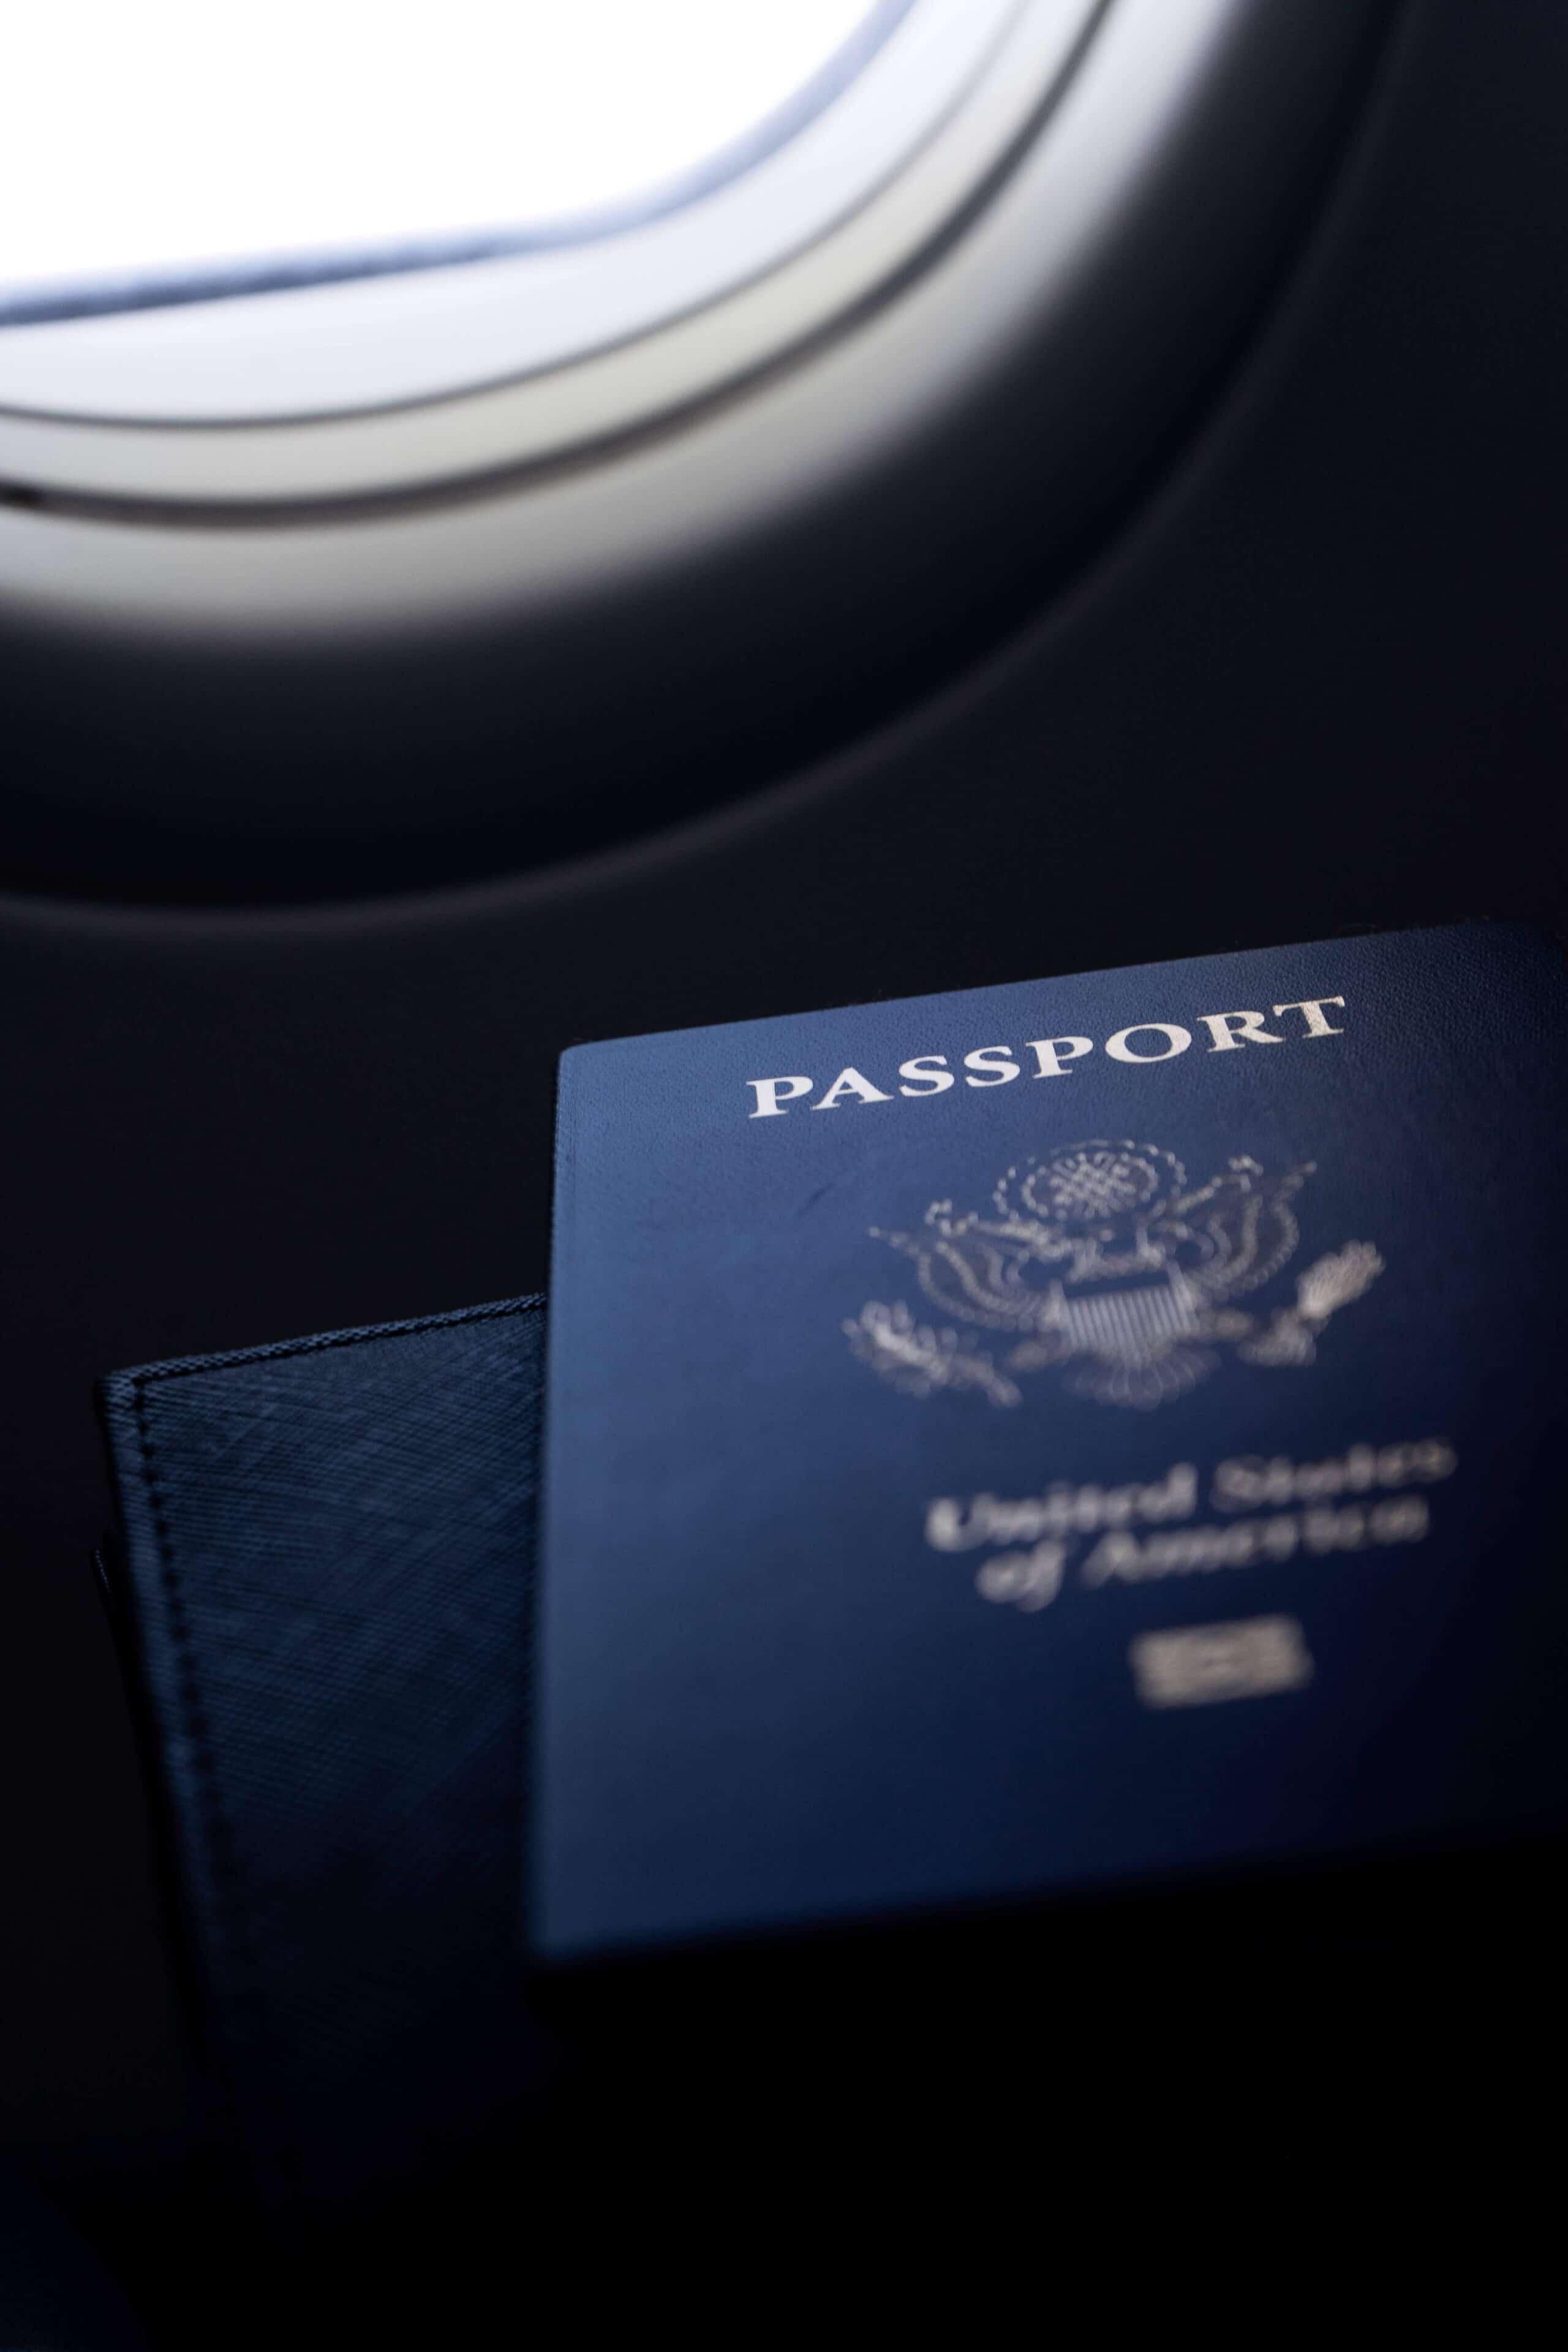 passport next to plane window - upsplash